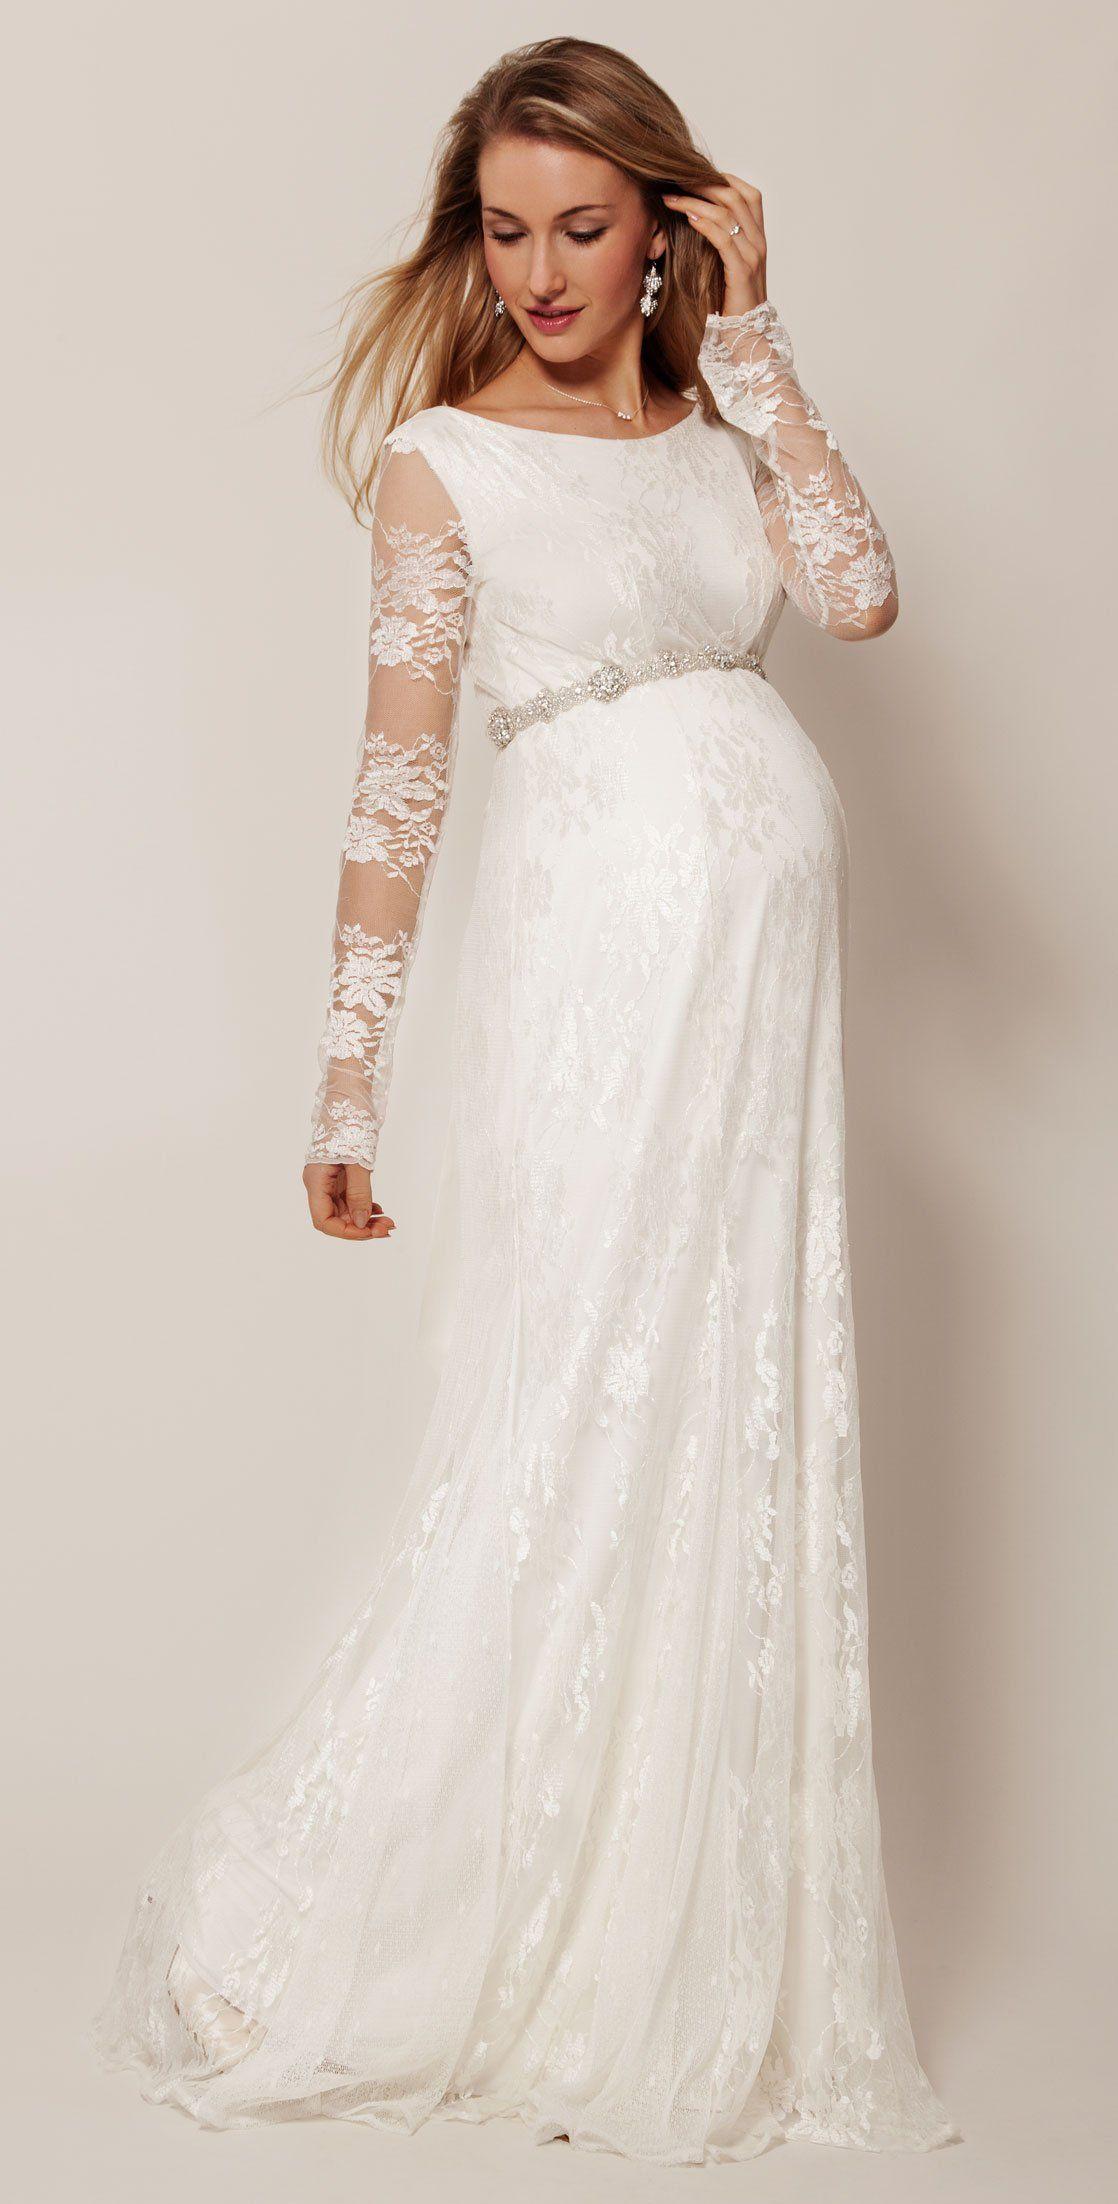 Maternity dresses for weddings  Tiffany Rose Helena Gown  Tiffany rose Wedding dress and Tiffany